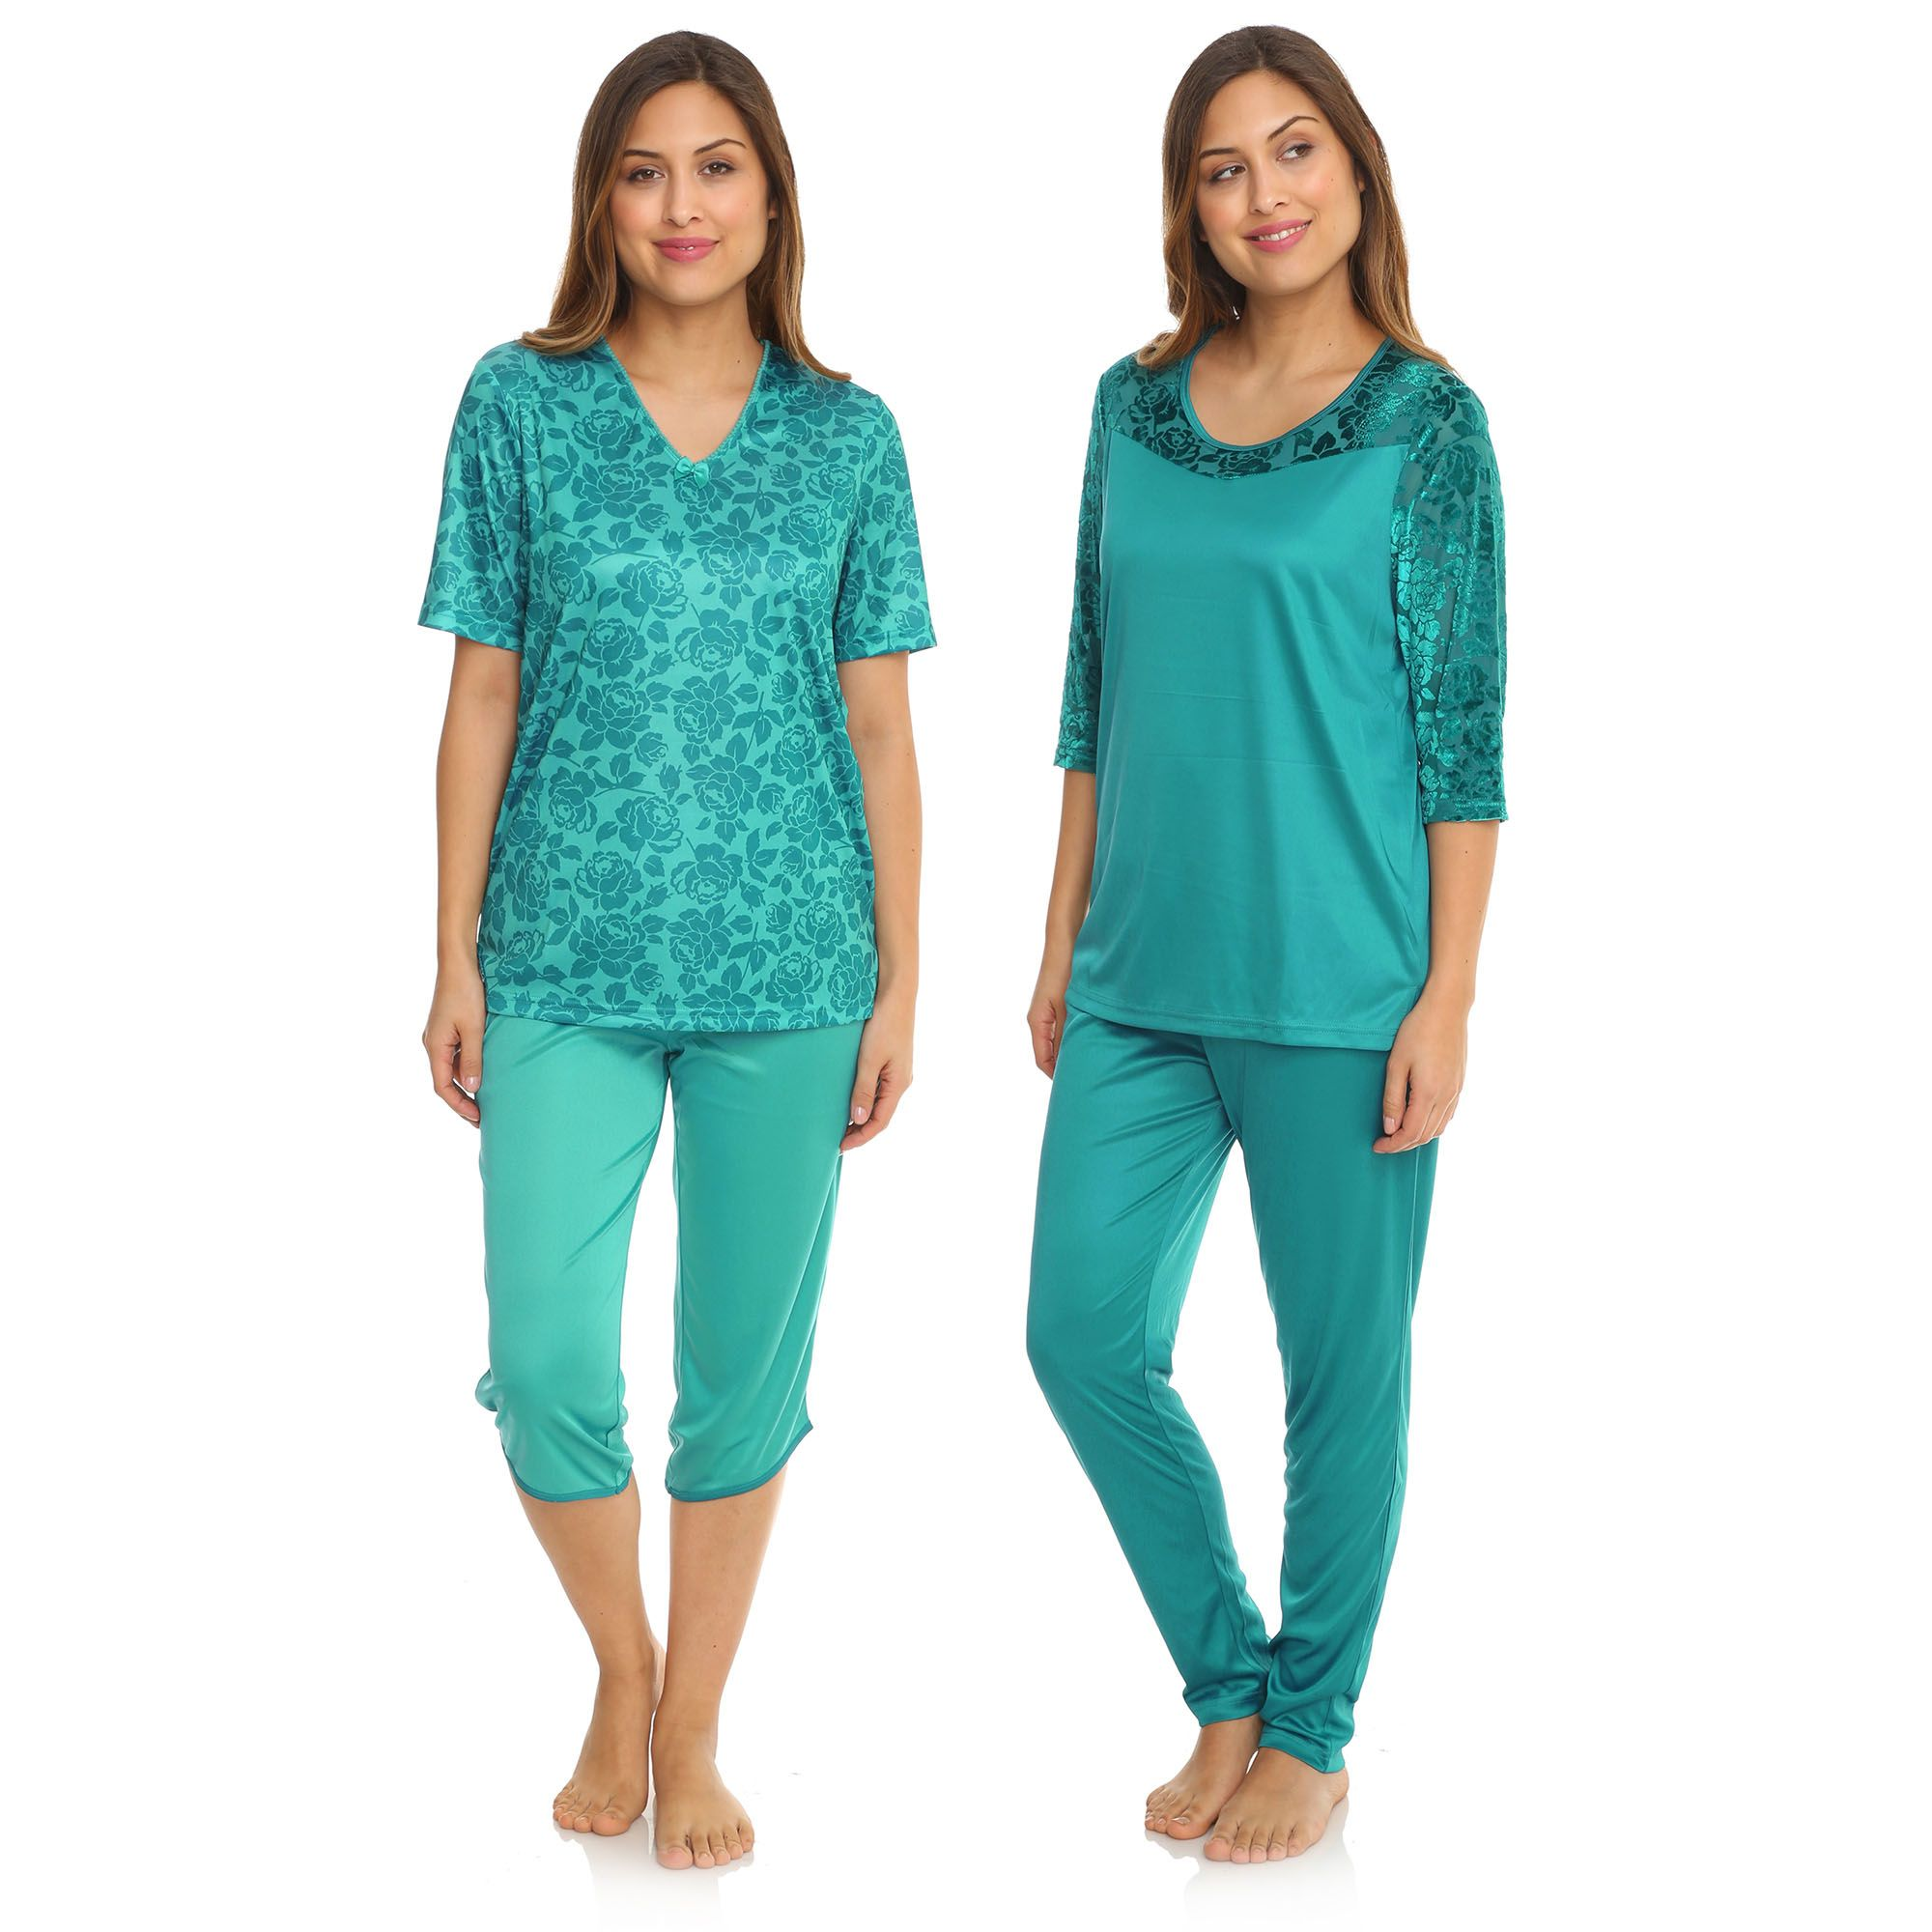 B-Ware LITTLE ROSE 2 Pyjamas Mikrofaser lange & kurze Form ...